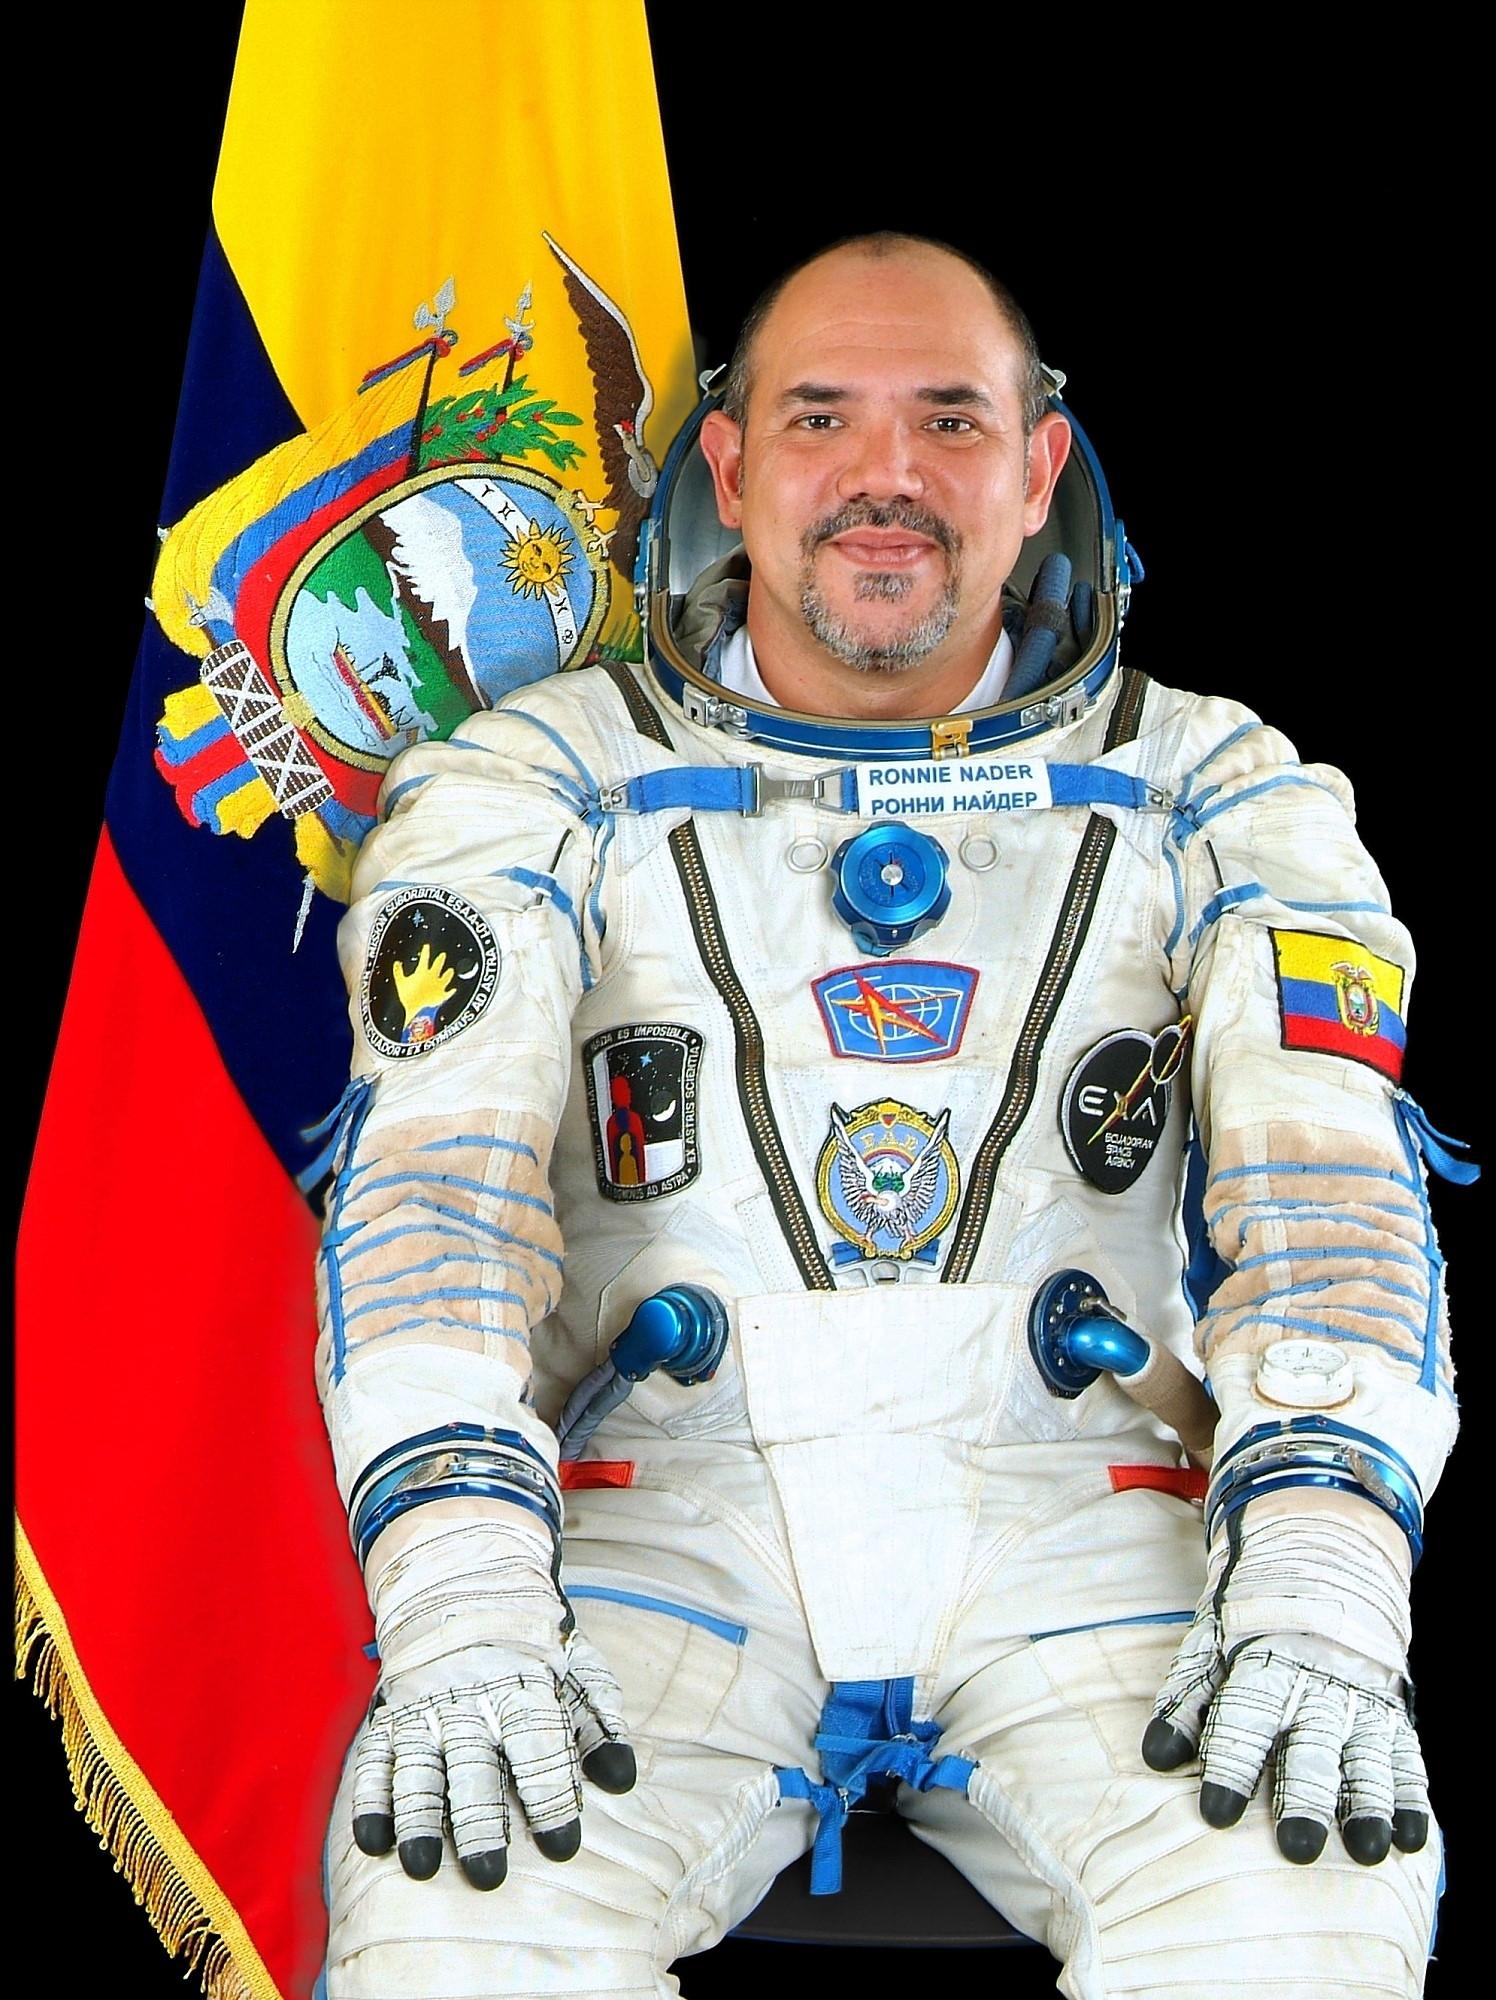 Biographies of Astronaut and Cosmonaut Candidates: David Eidsaune